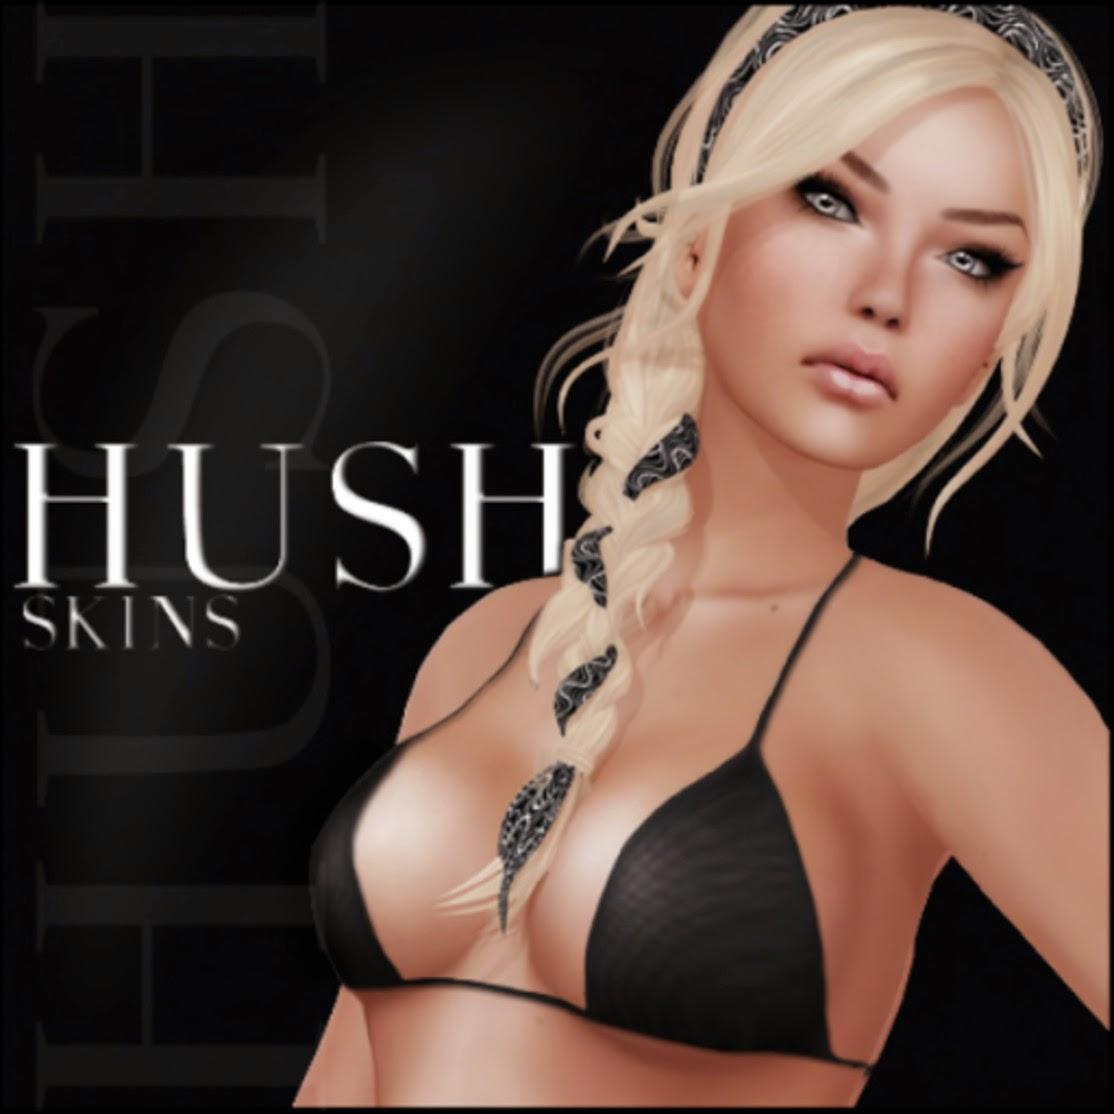 [Hush]